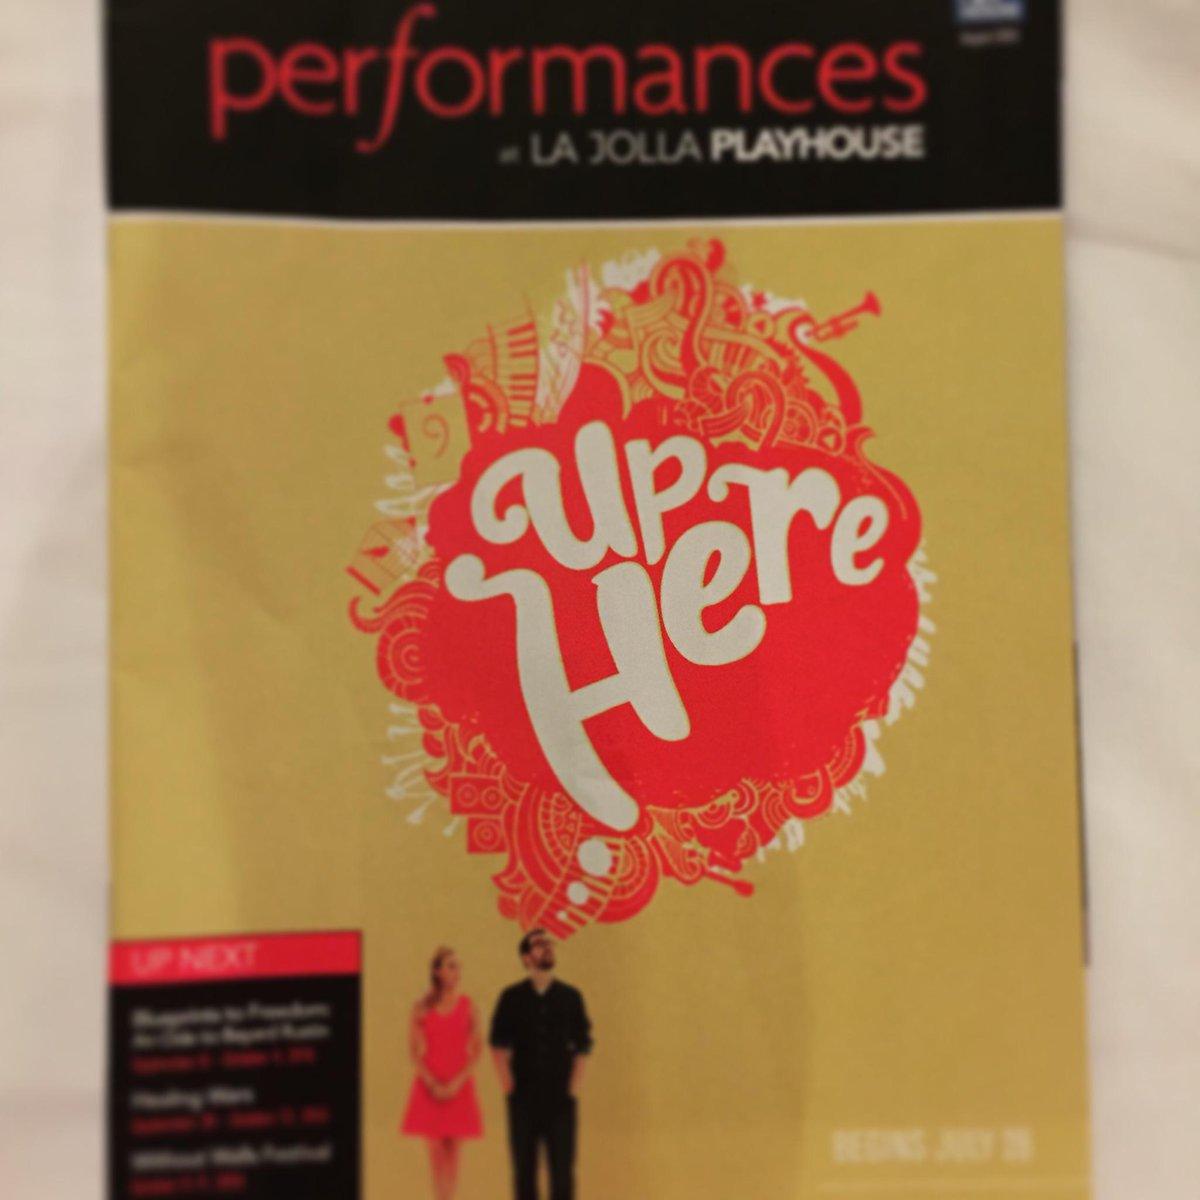 #UpHere performances @lajollaplayhouse have begun! #rundontwalk http://t.co/9PZueZap8d